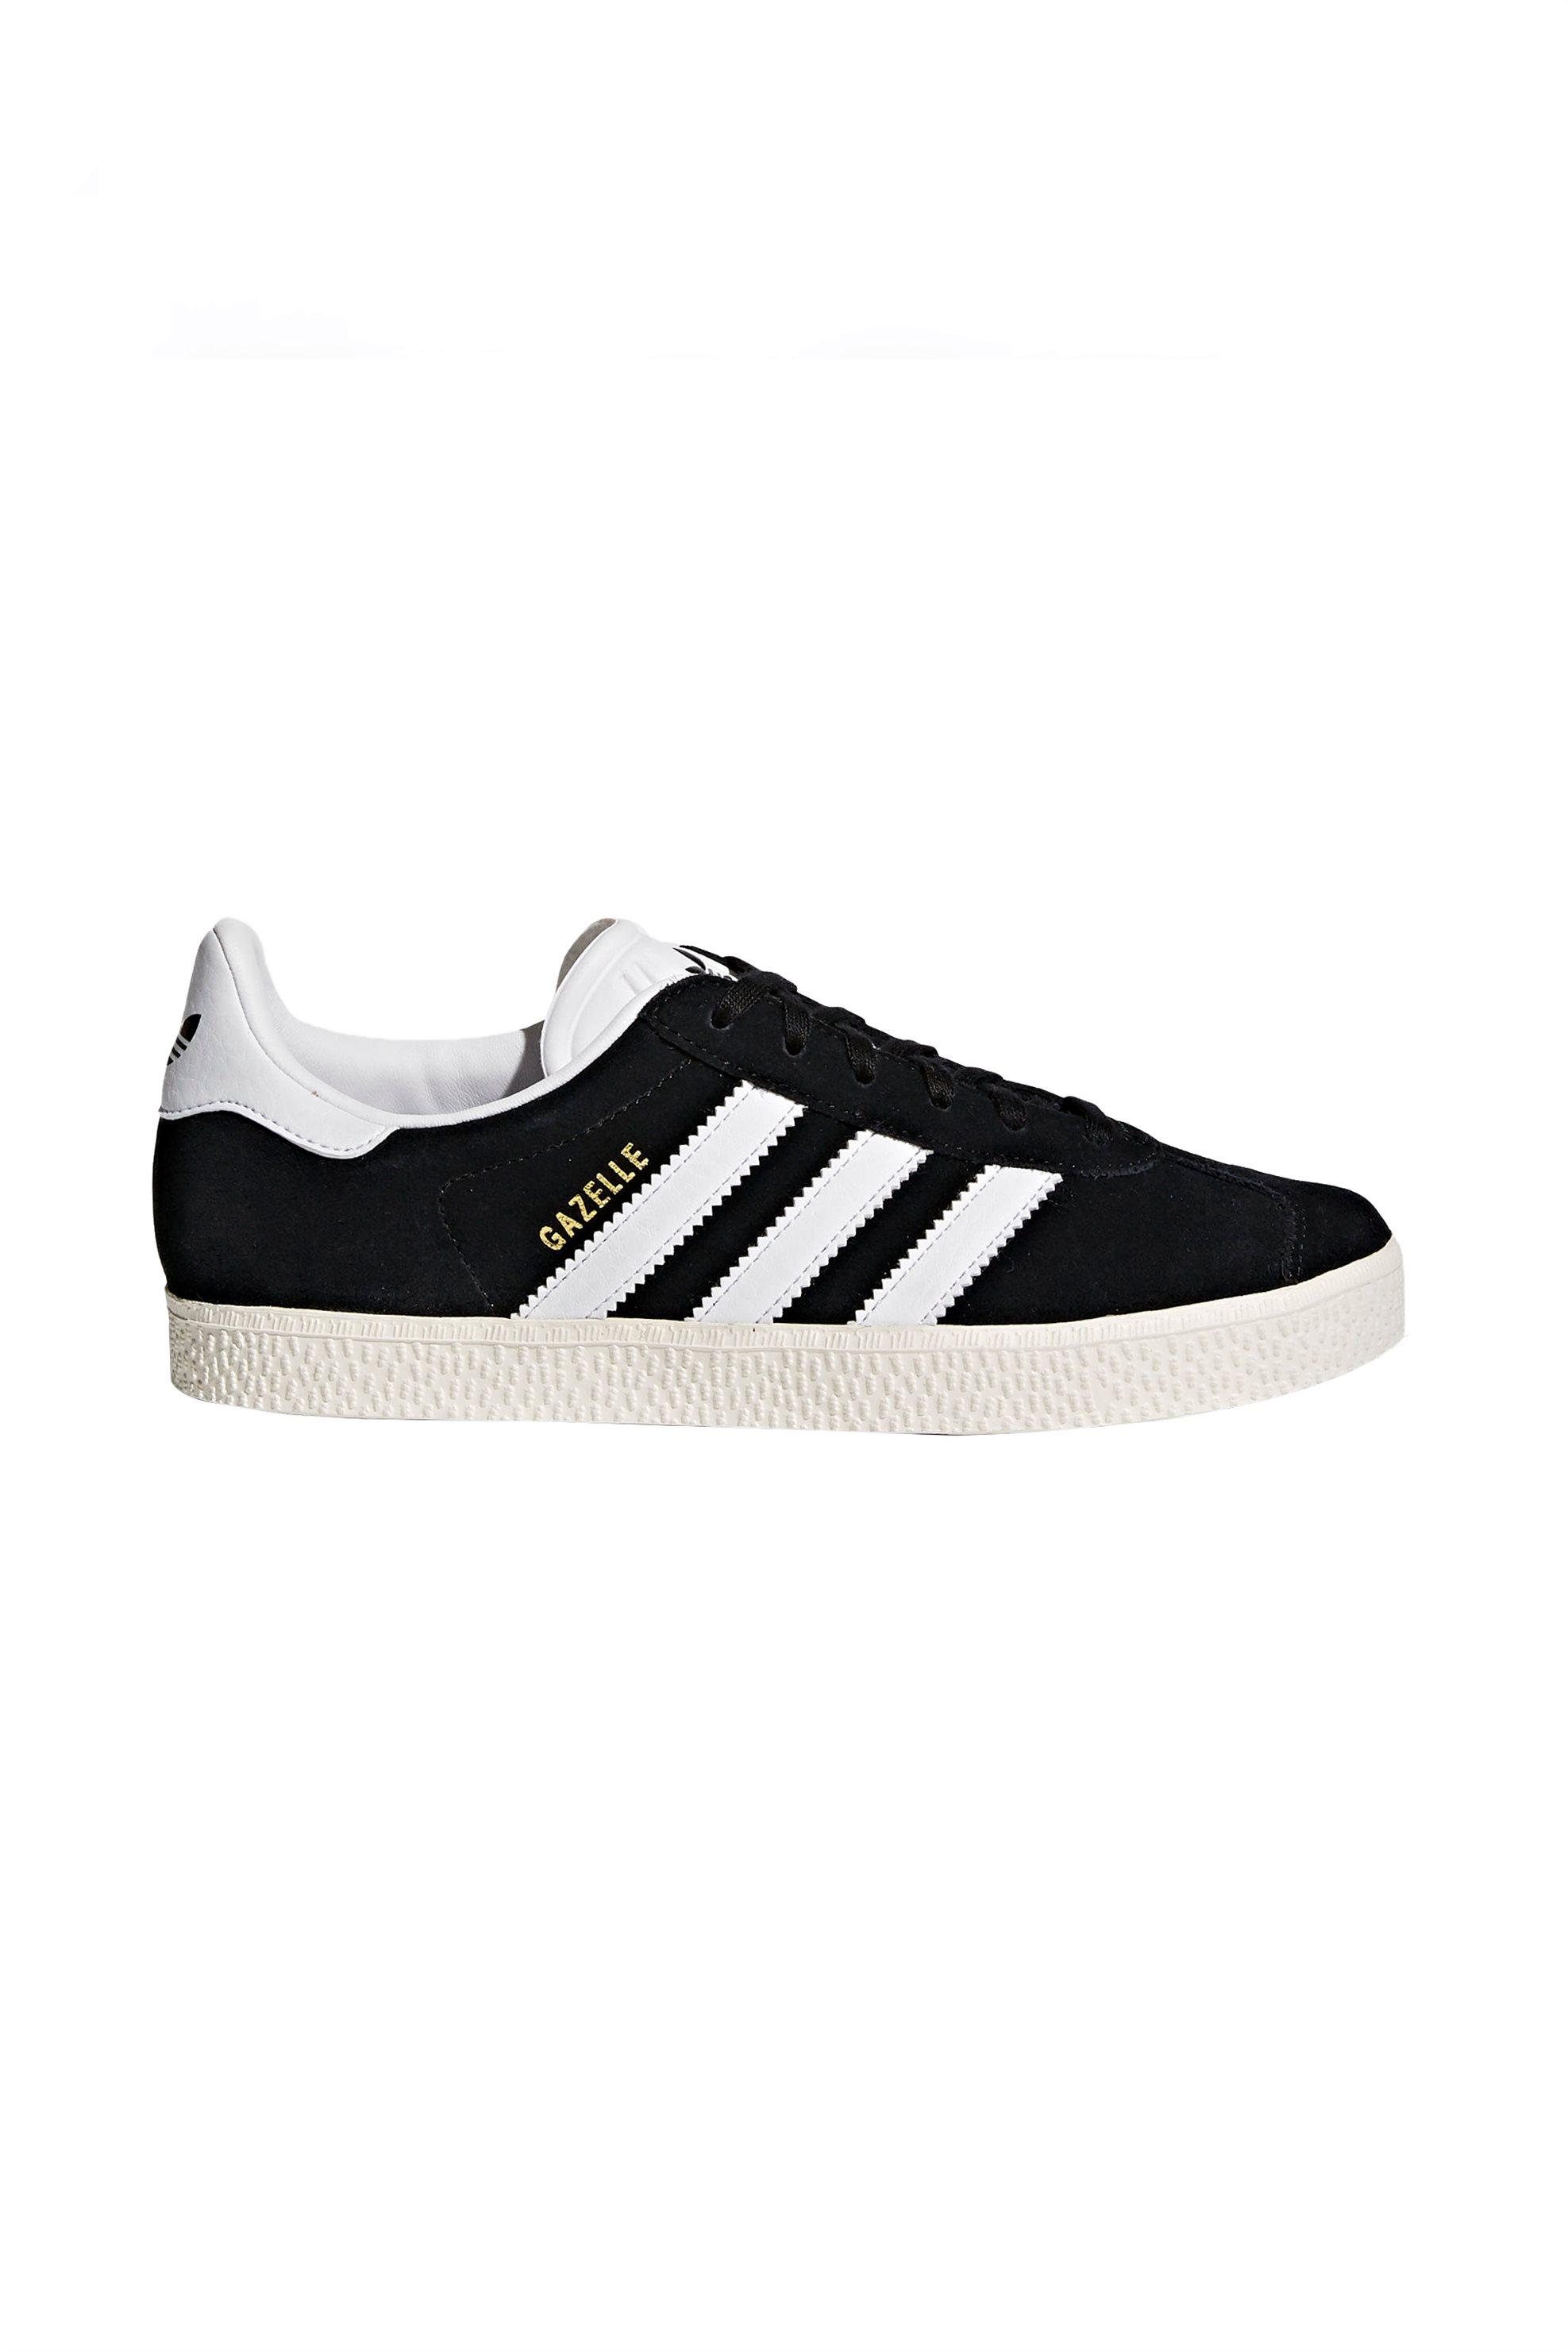 finest selection 641bd 4ce36 Notos Adidas παιδικά αθλητικά παπούτσια Gazelle – BB2502 – Μαύρο